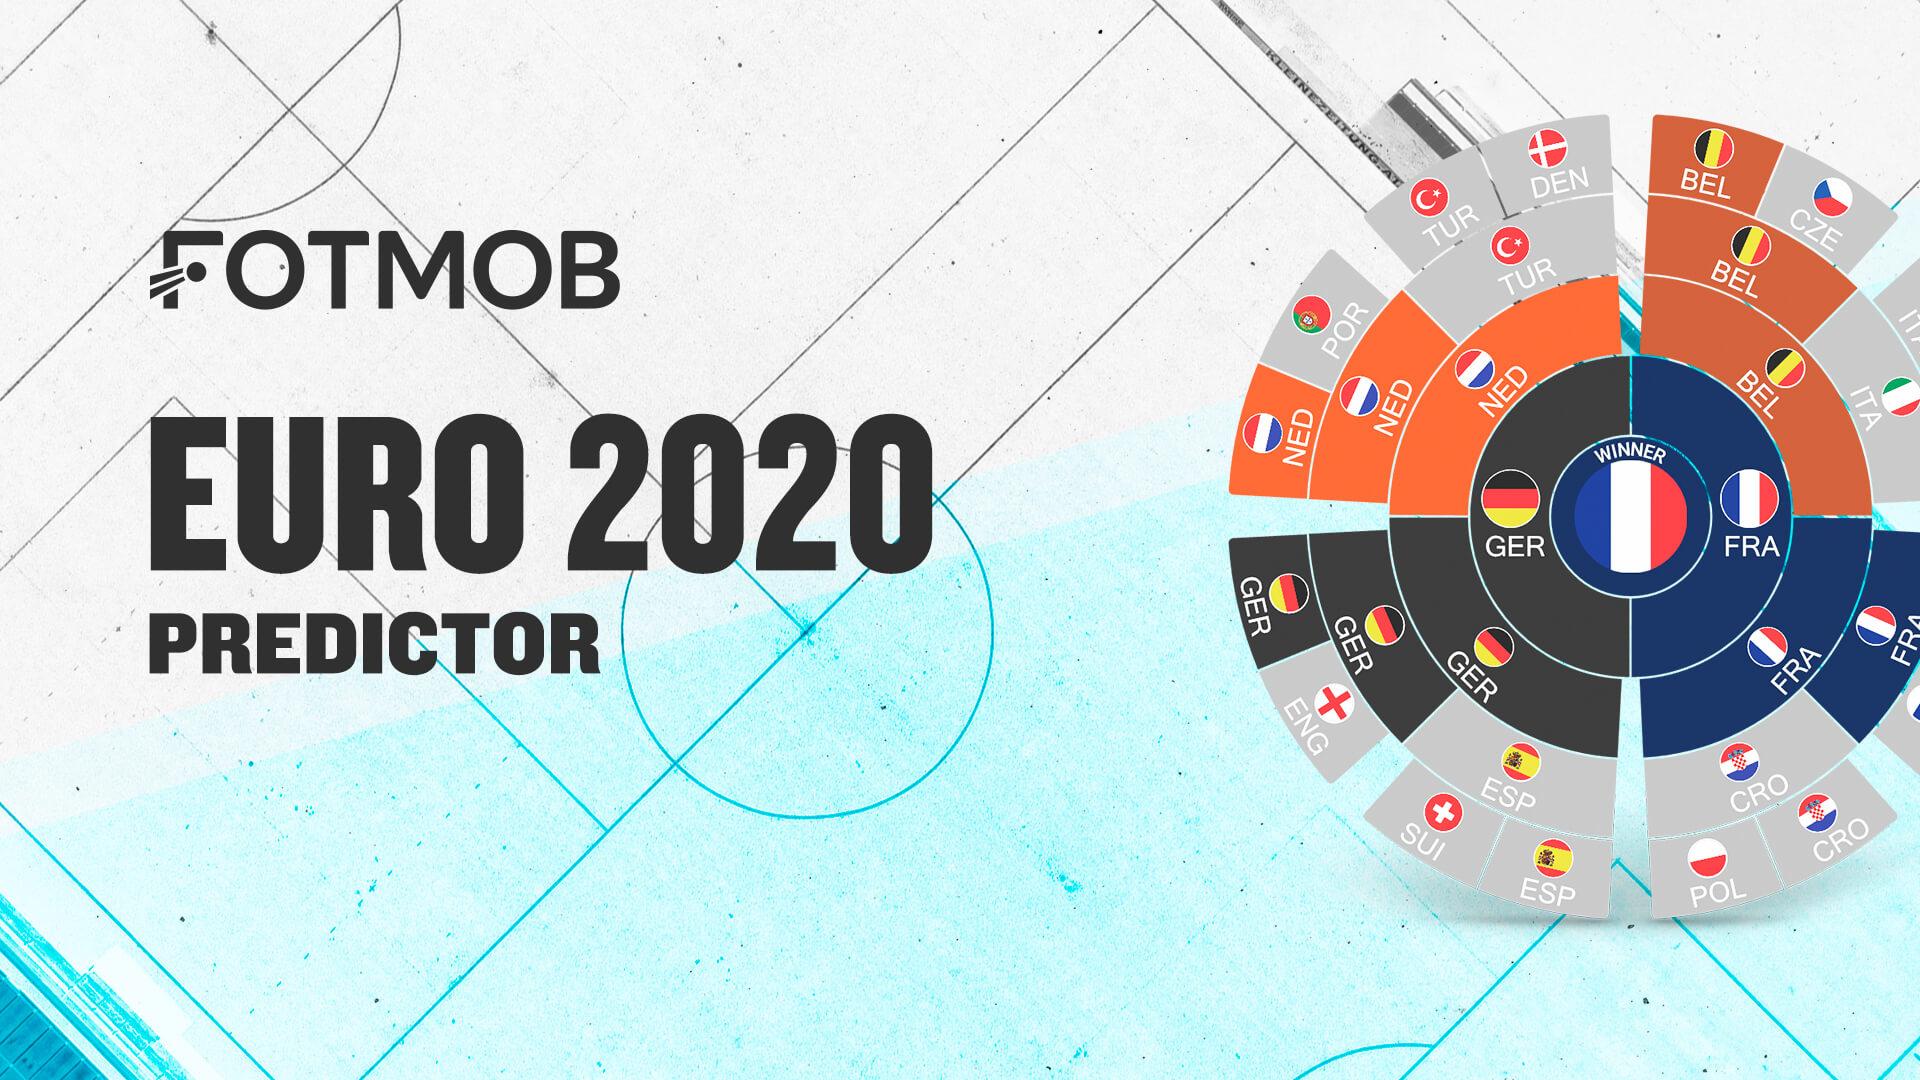 Play FotMob's Euro 2020 Predictor